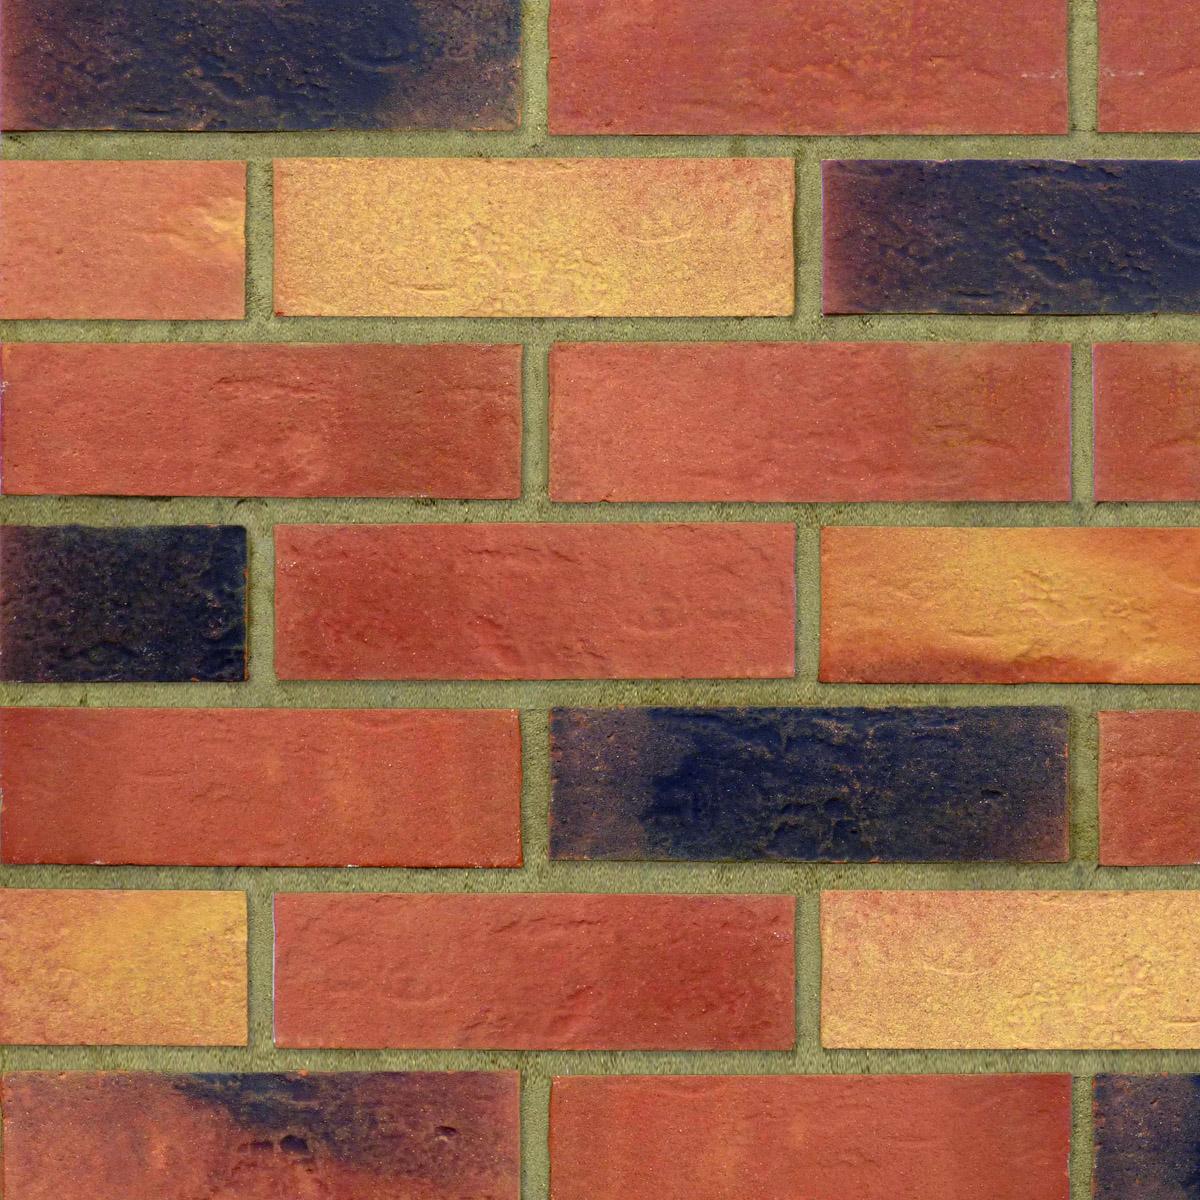 Stainton Antique Bricks - Neutral